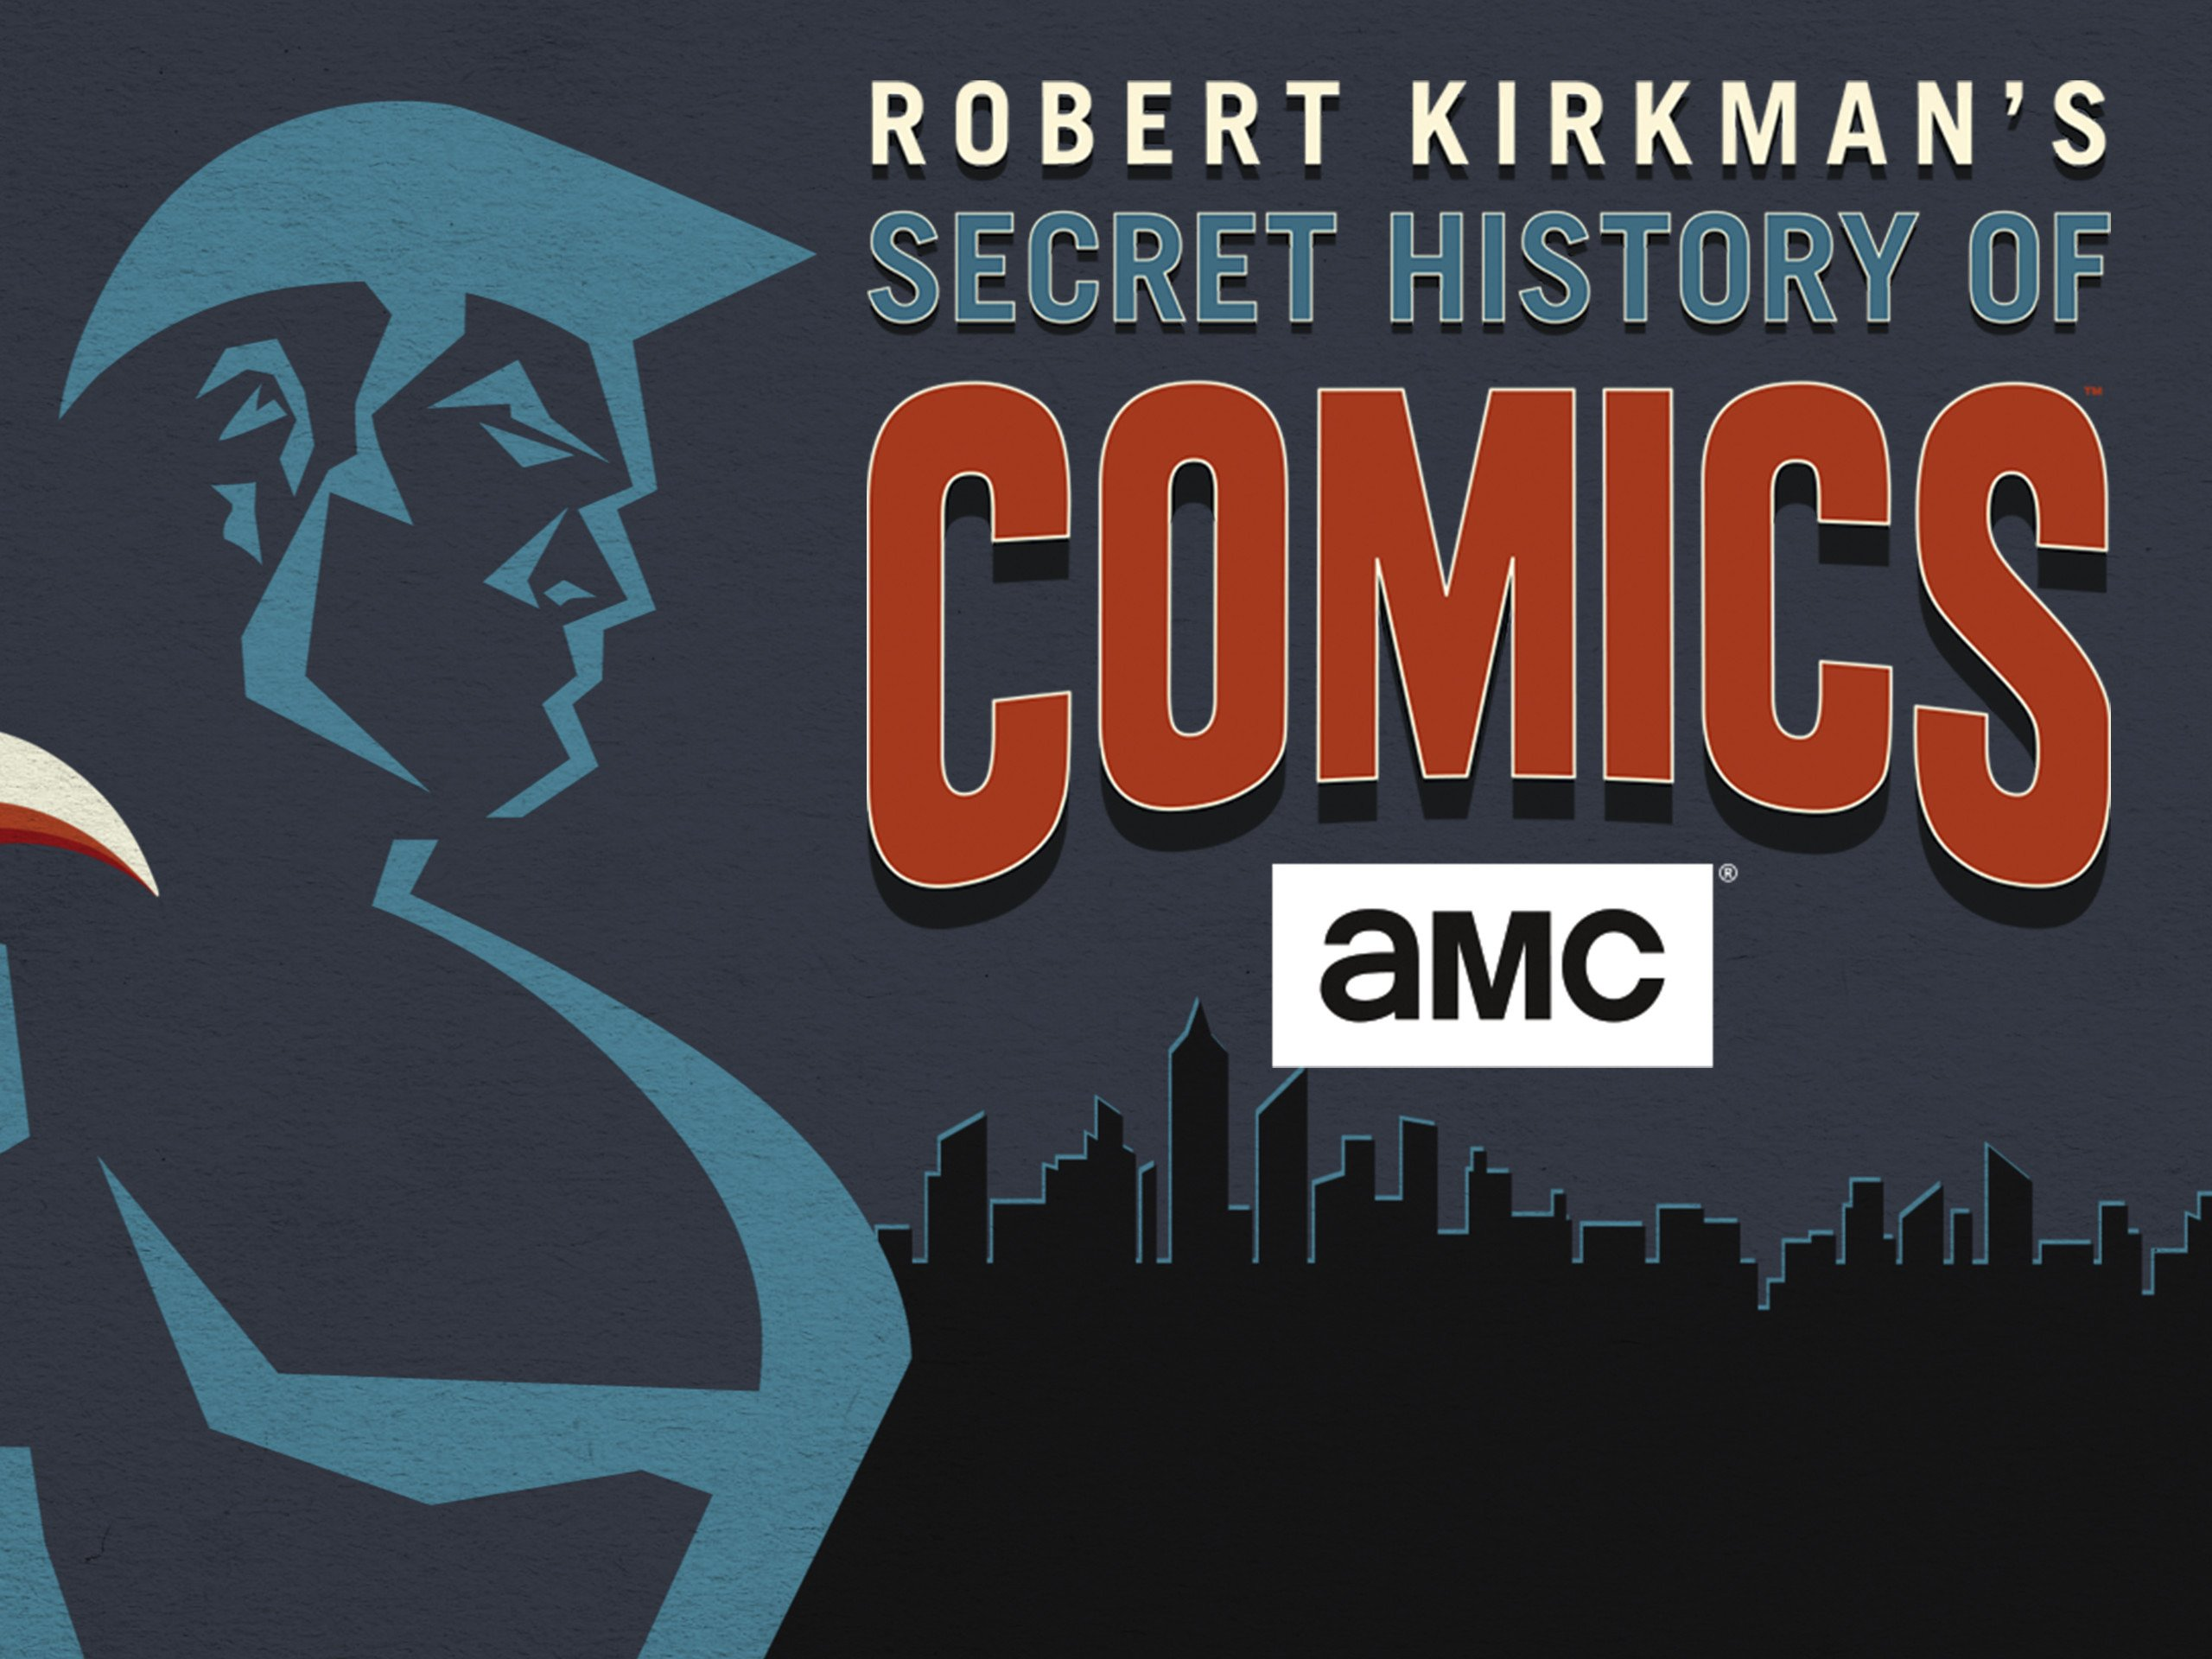 Amazon.com: Robert Kirkmans Secret History of Comics Season 1 ...